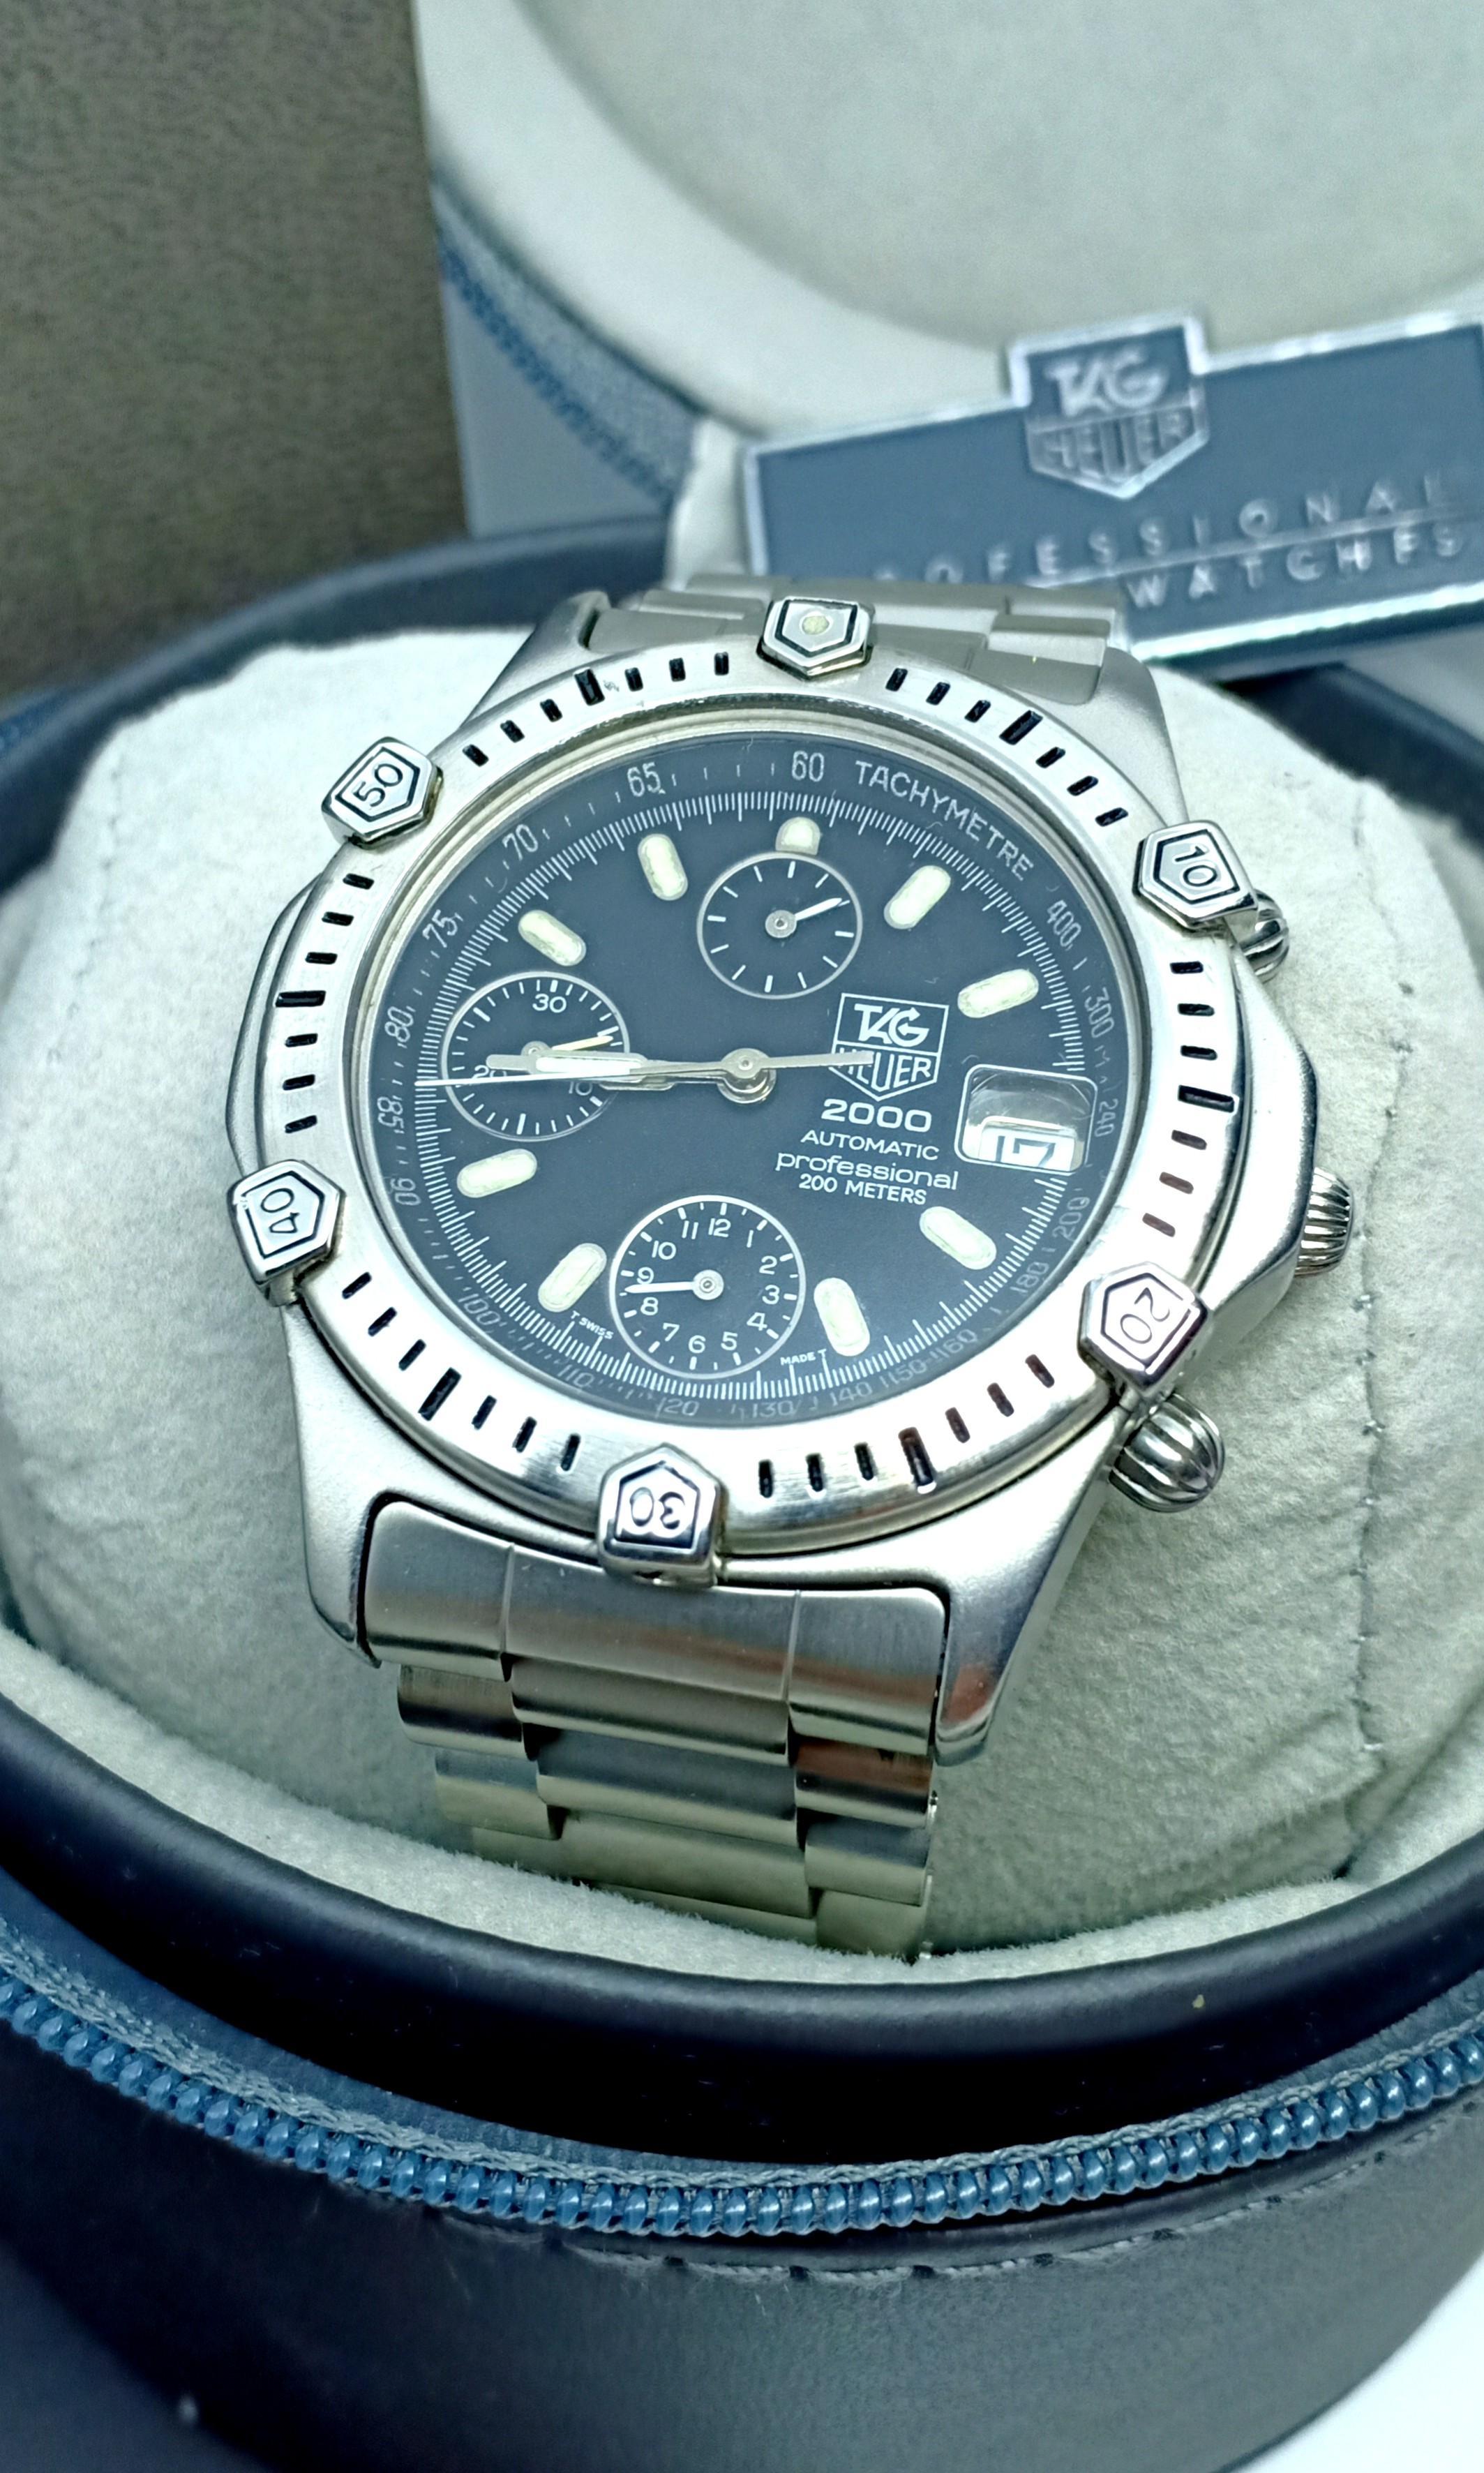 Tag heuer star fish automatic tripple chronograph no tissot omega hamilton zenith ulysse girard jaeger bulgari oris mido longines baume vintage